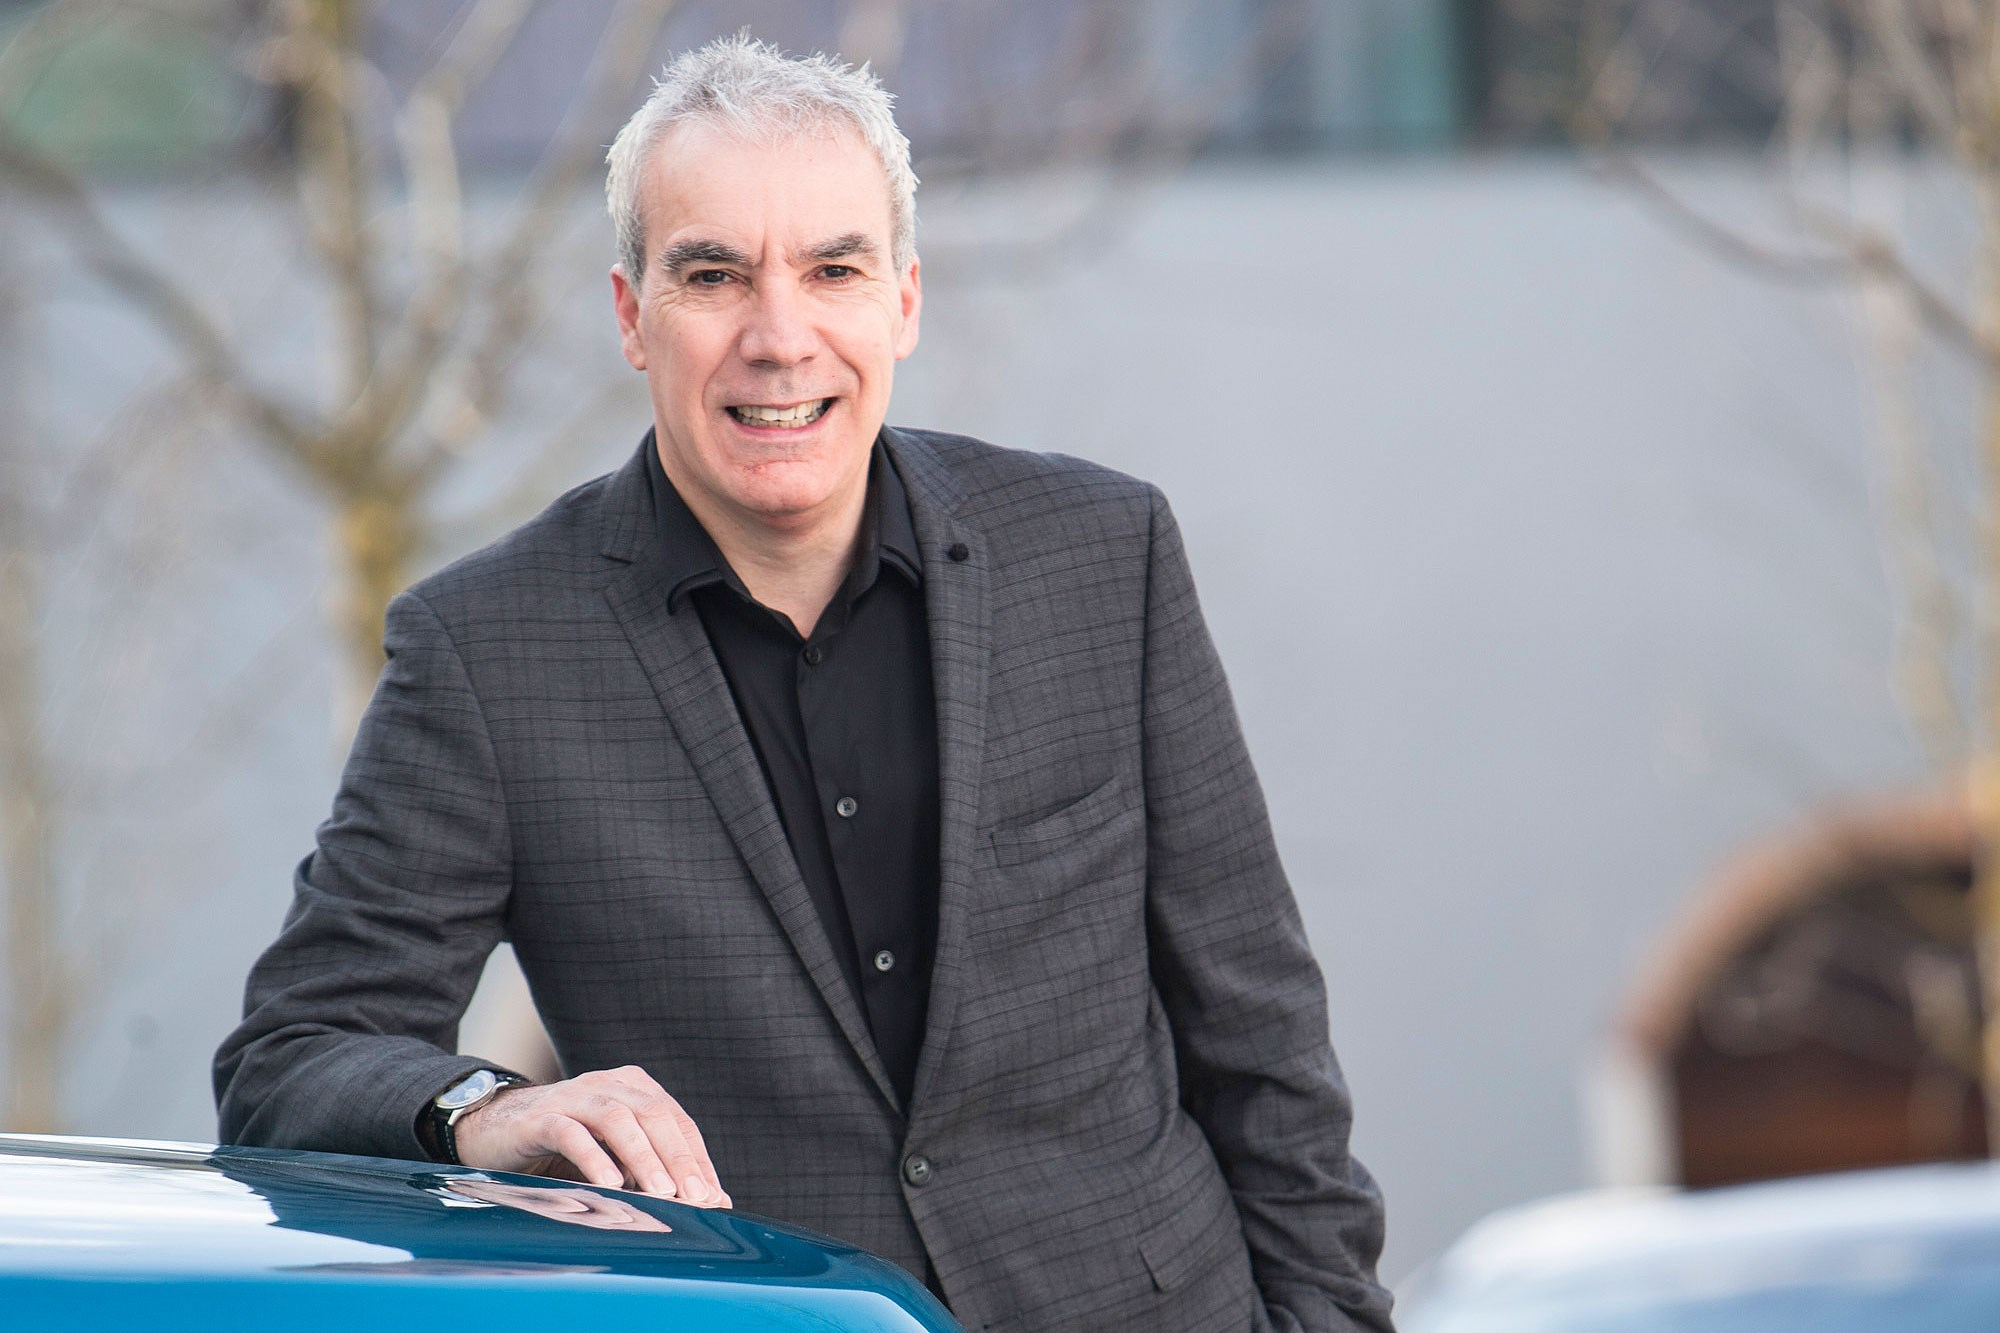 Dale Wyatt, managing director, Suzuki GB